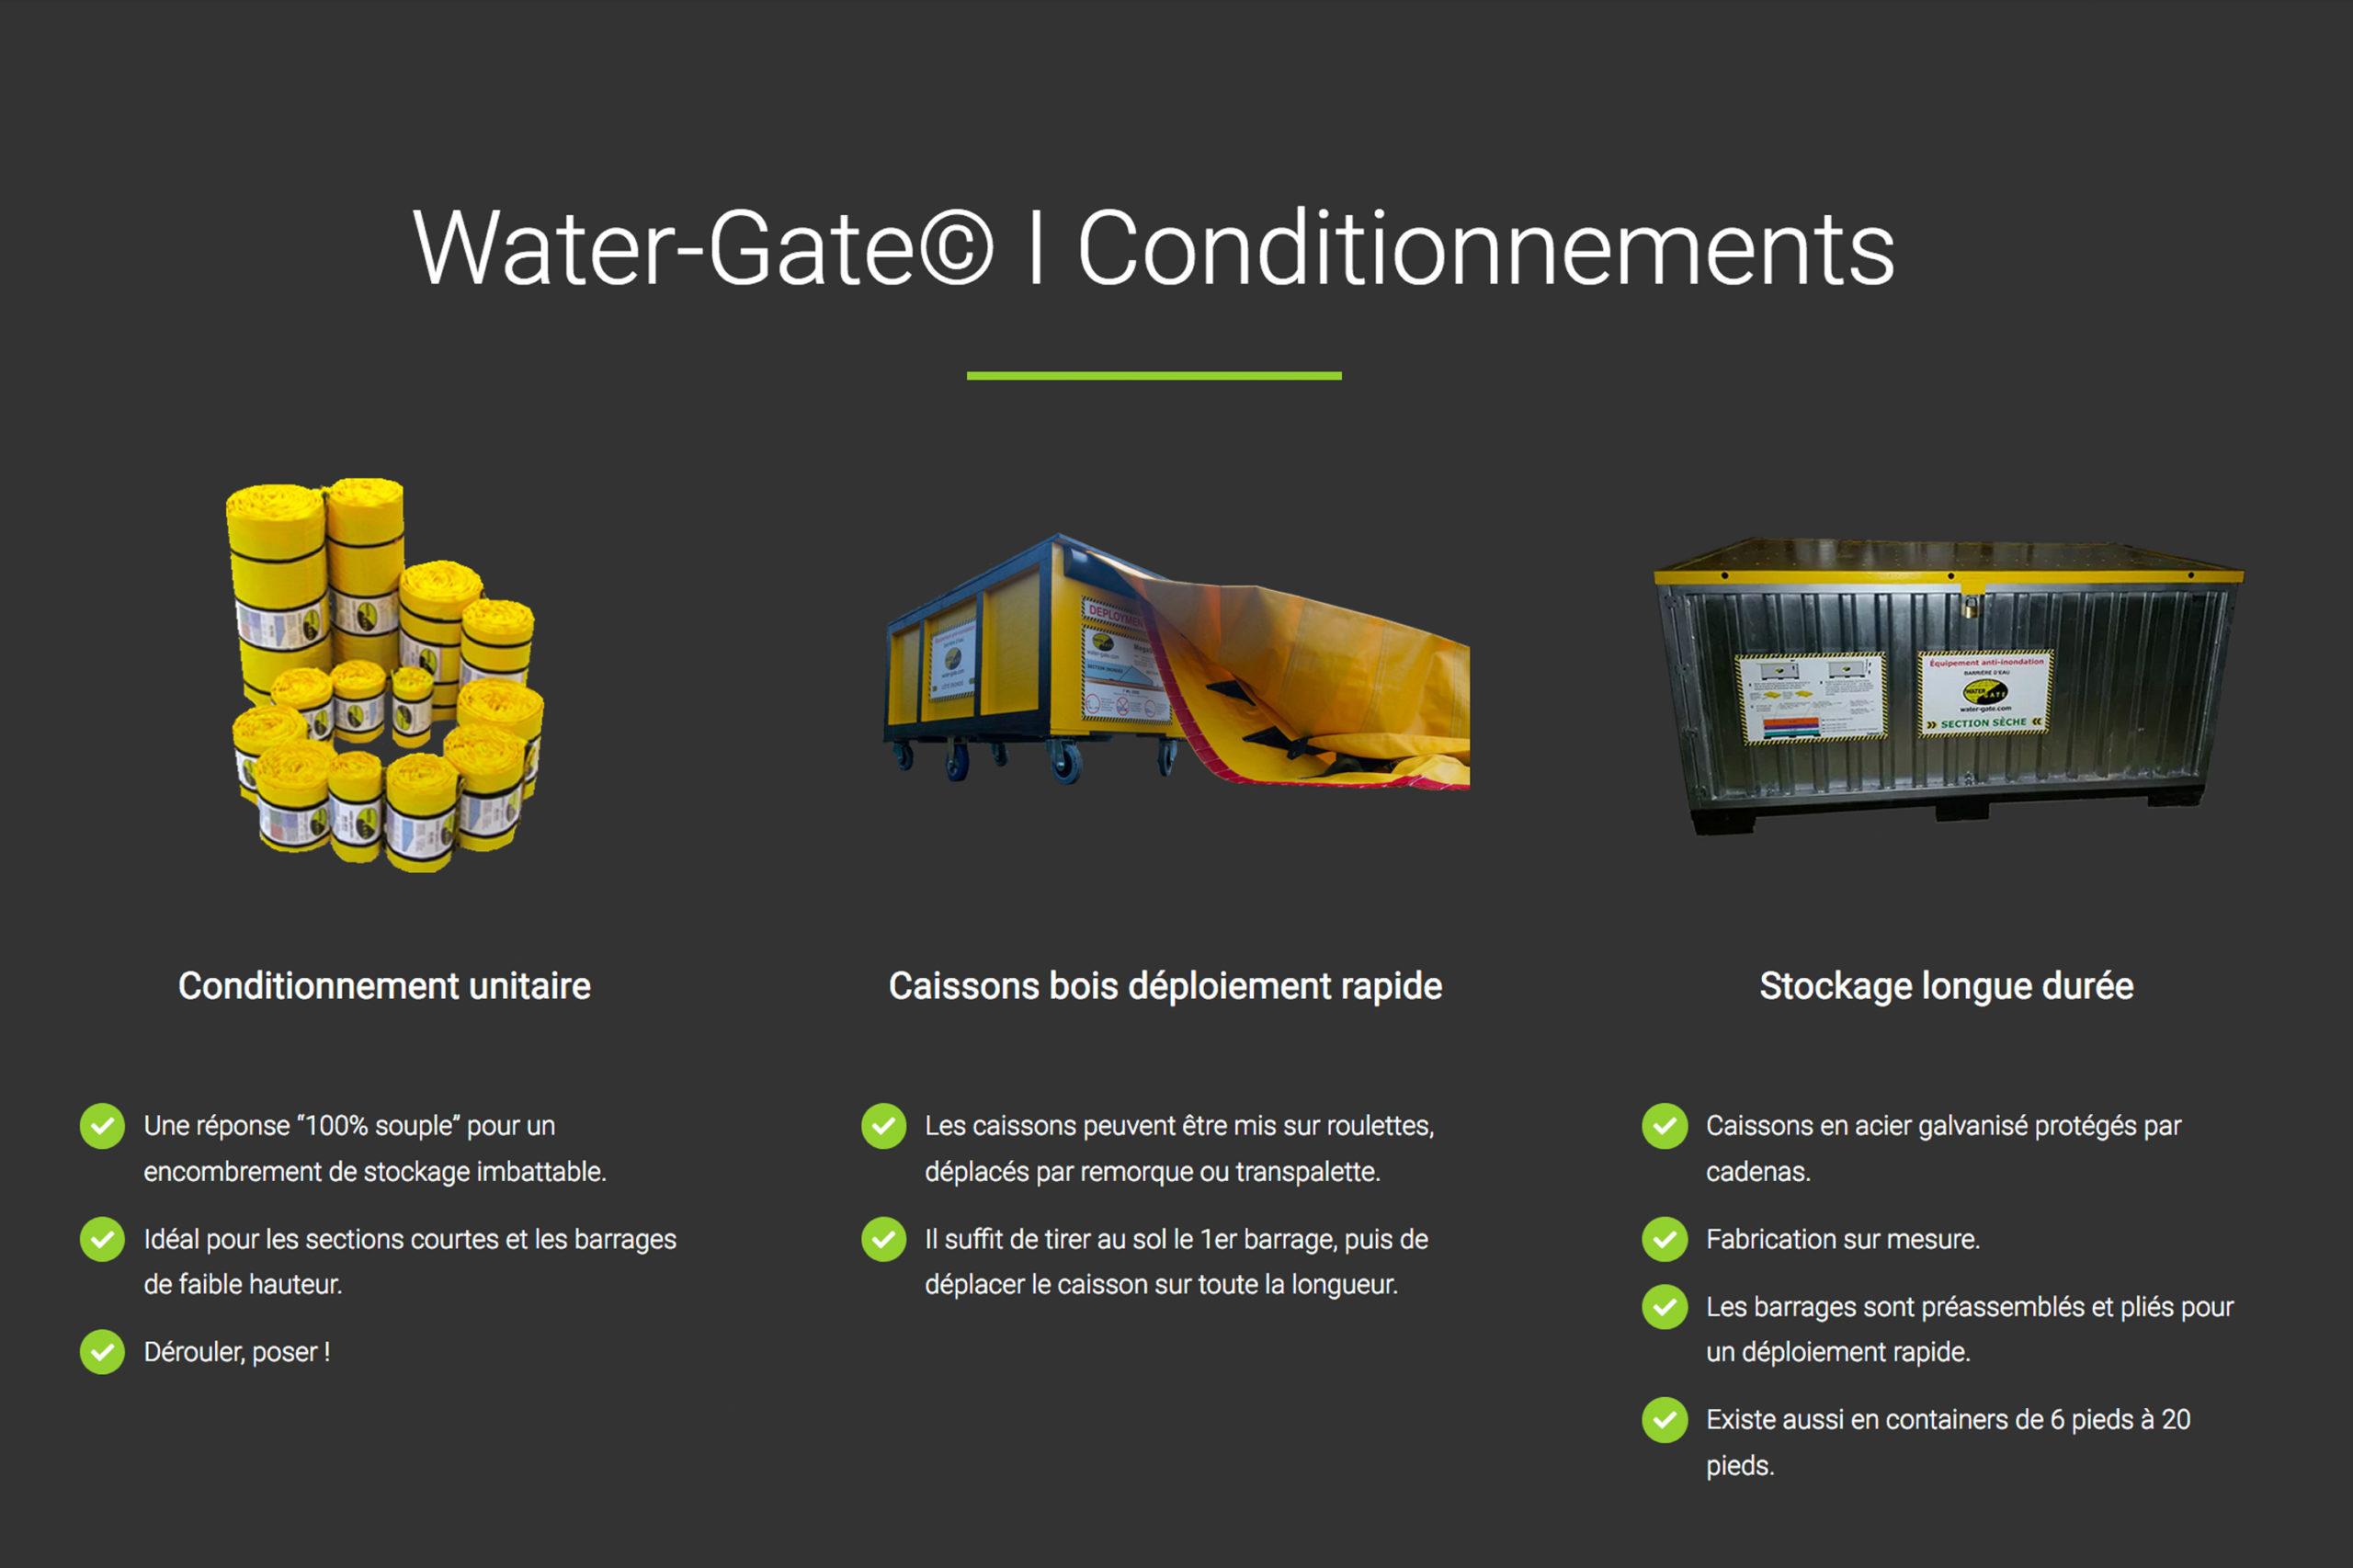 Conditionnement digue anti inondations Watergate